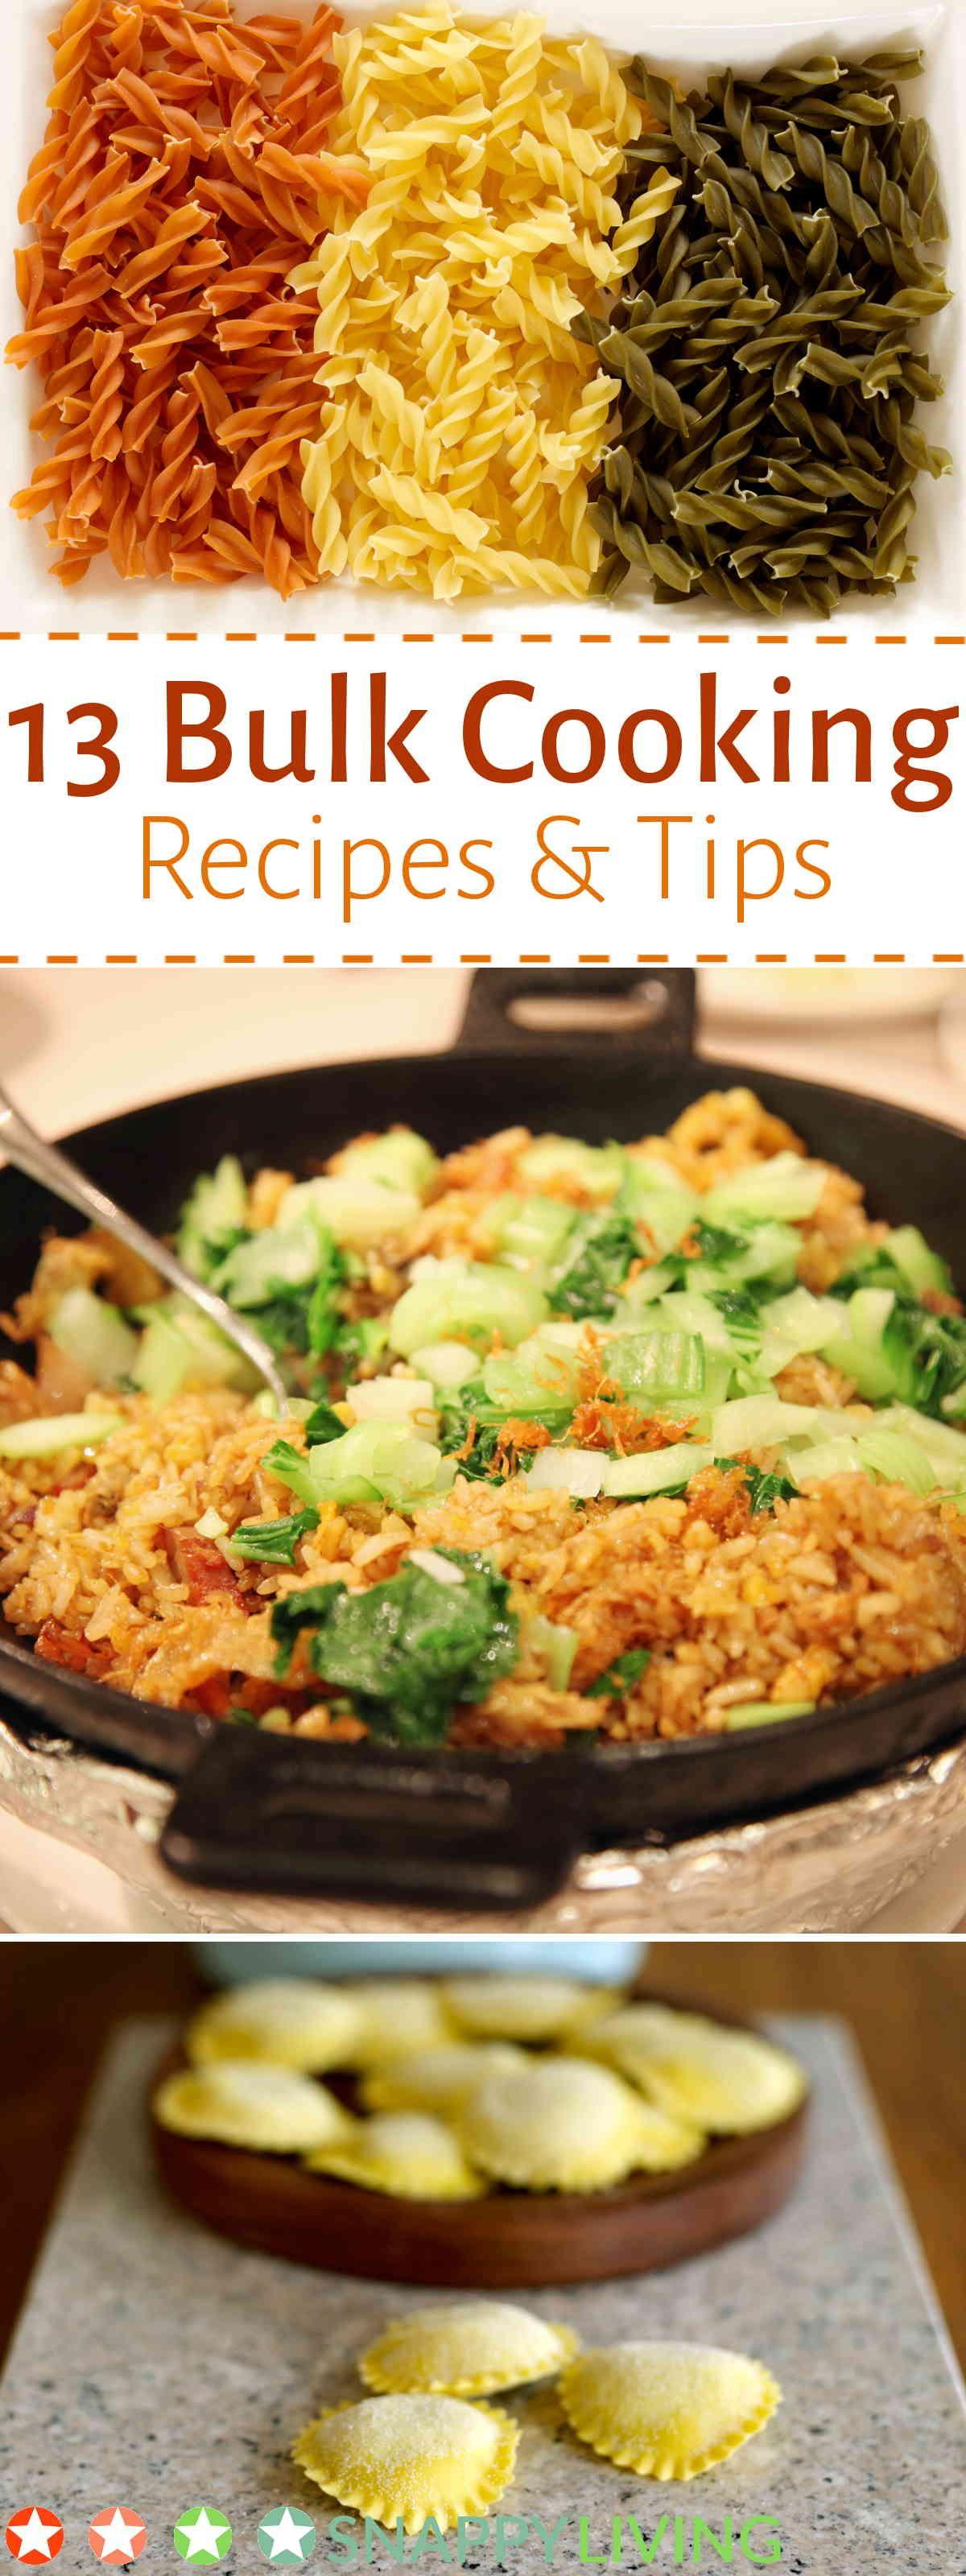 foto 13 Fall Recipes for Entertaining